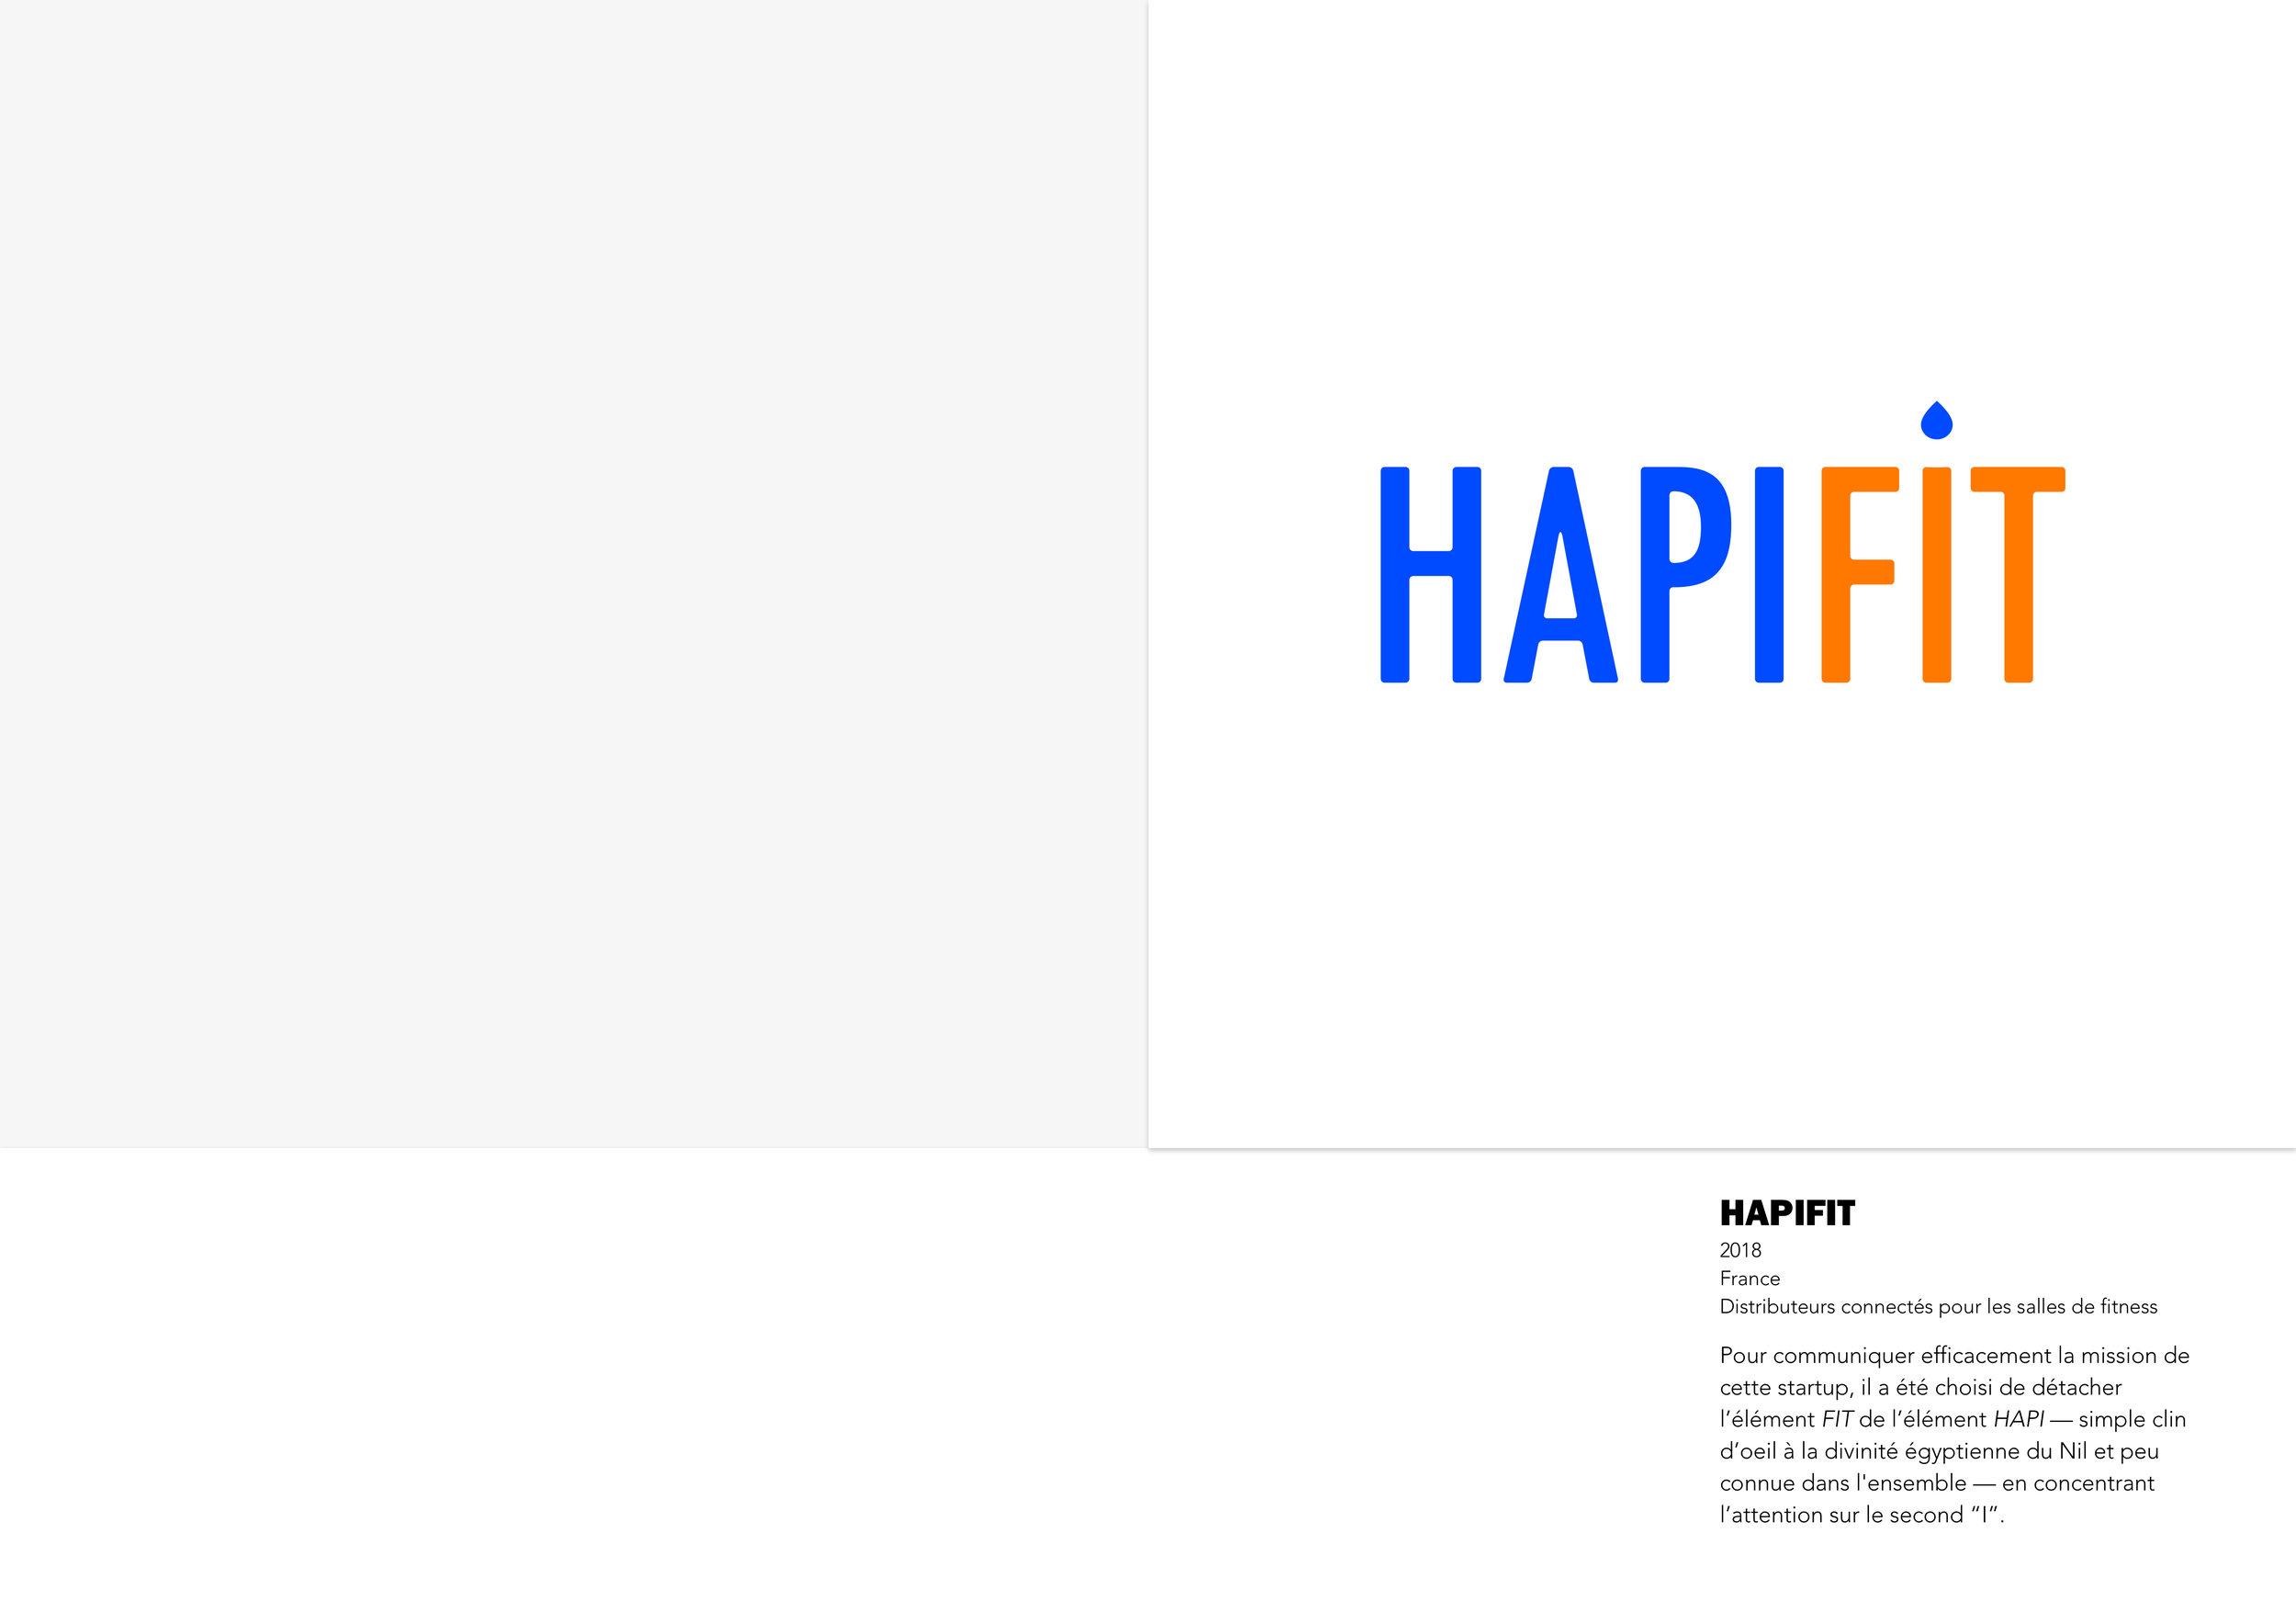 Hapifit-hydratation-fitness-logo-design-joy-lasry.jpg